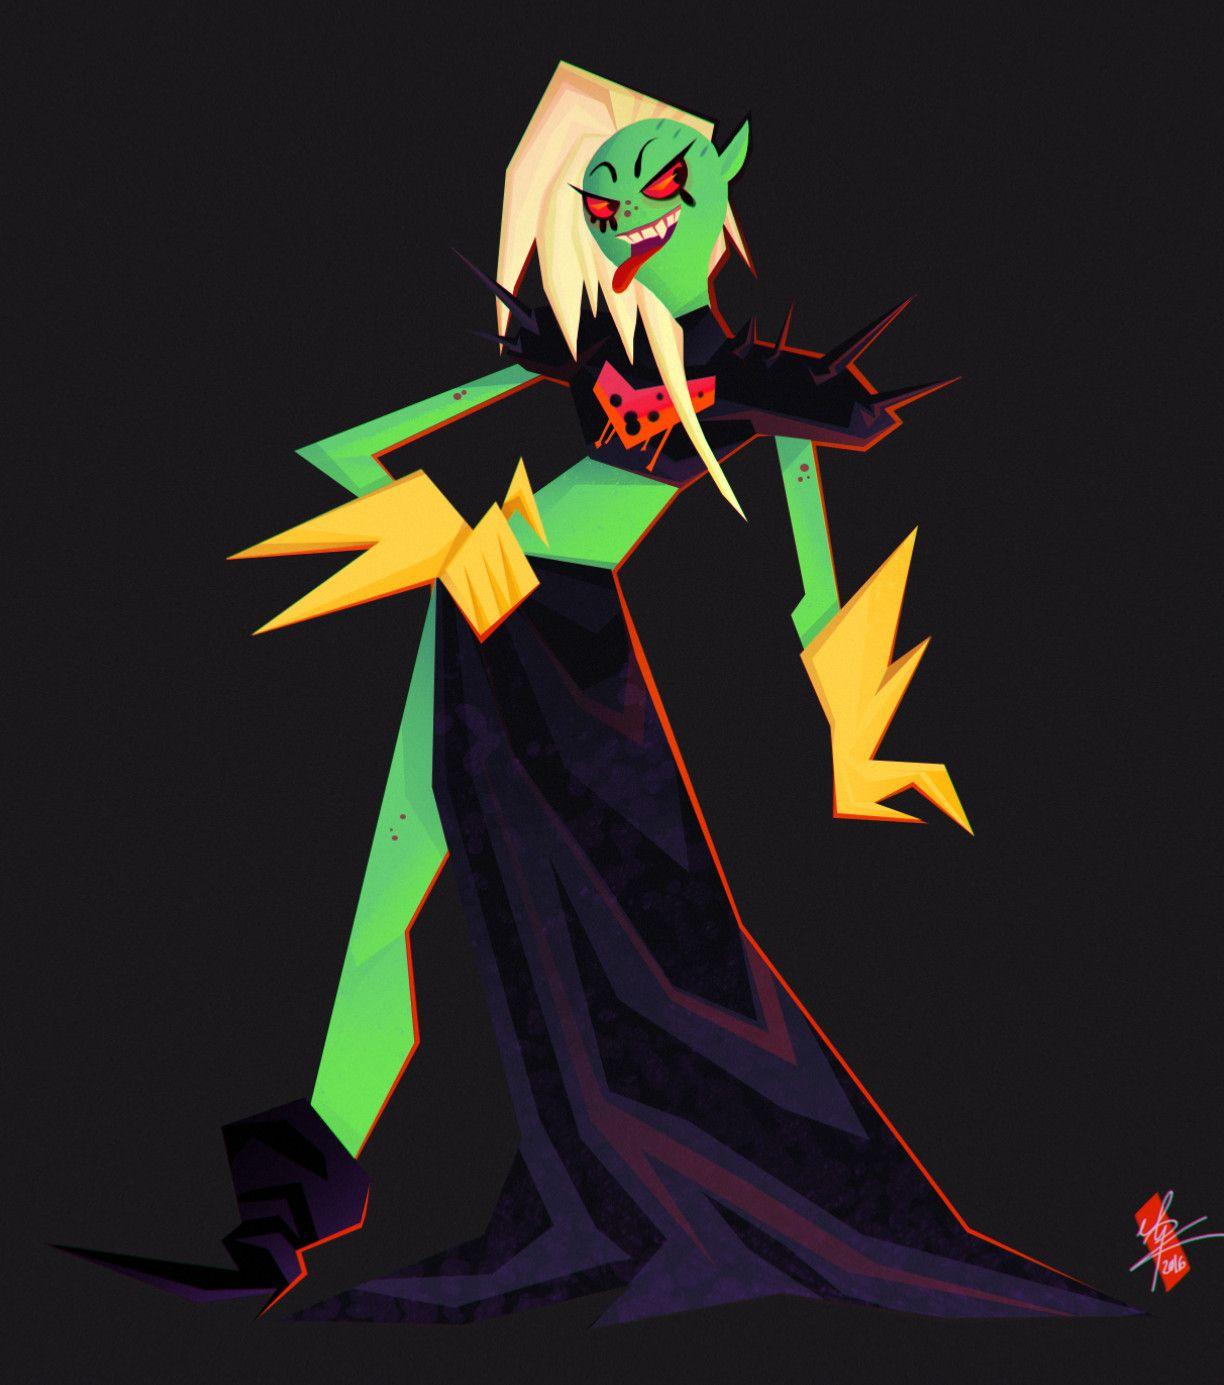 ArtStation - Lord Dominator, Lilith Pilgaard Knudsen